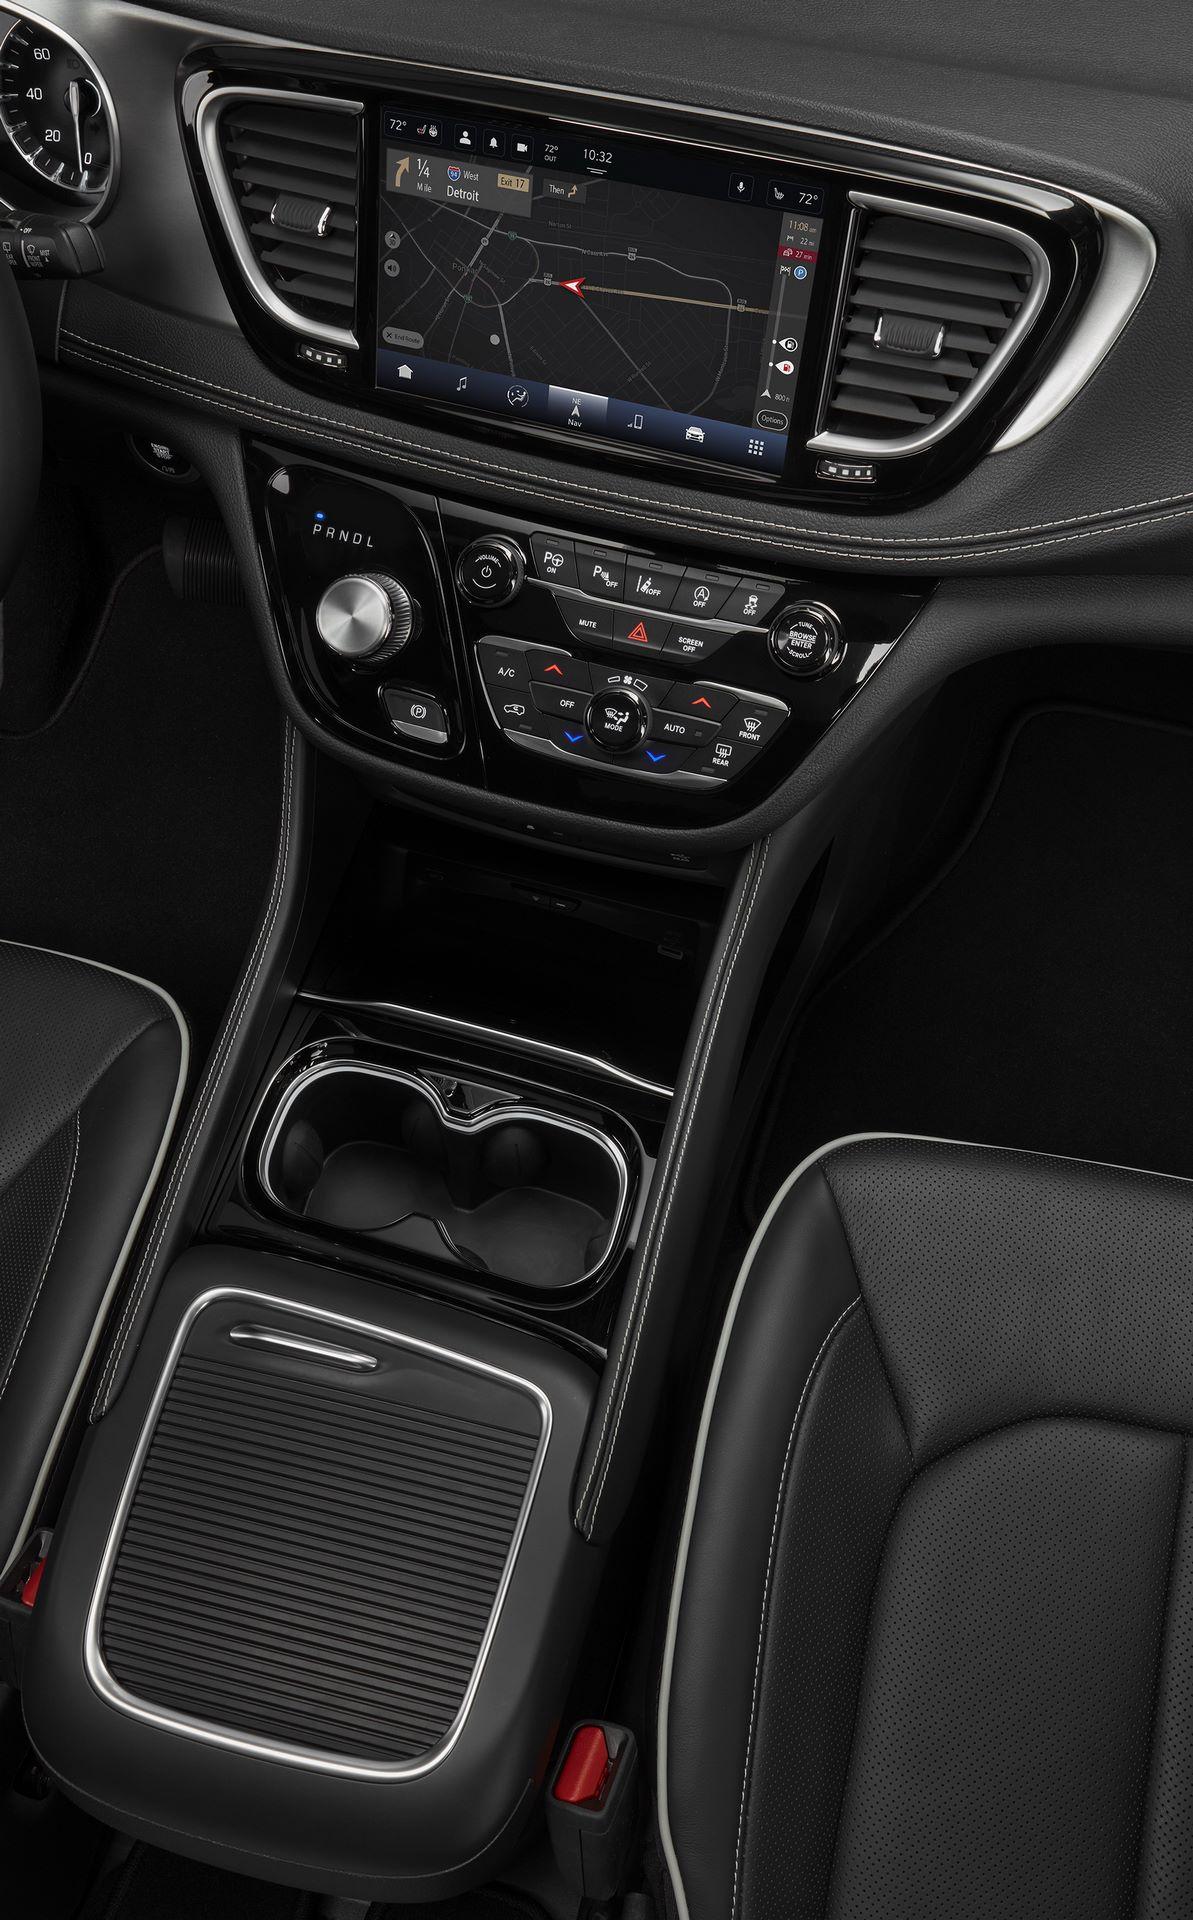 2021-Chrysler-Pacifica-140